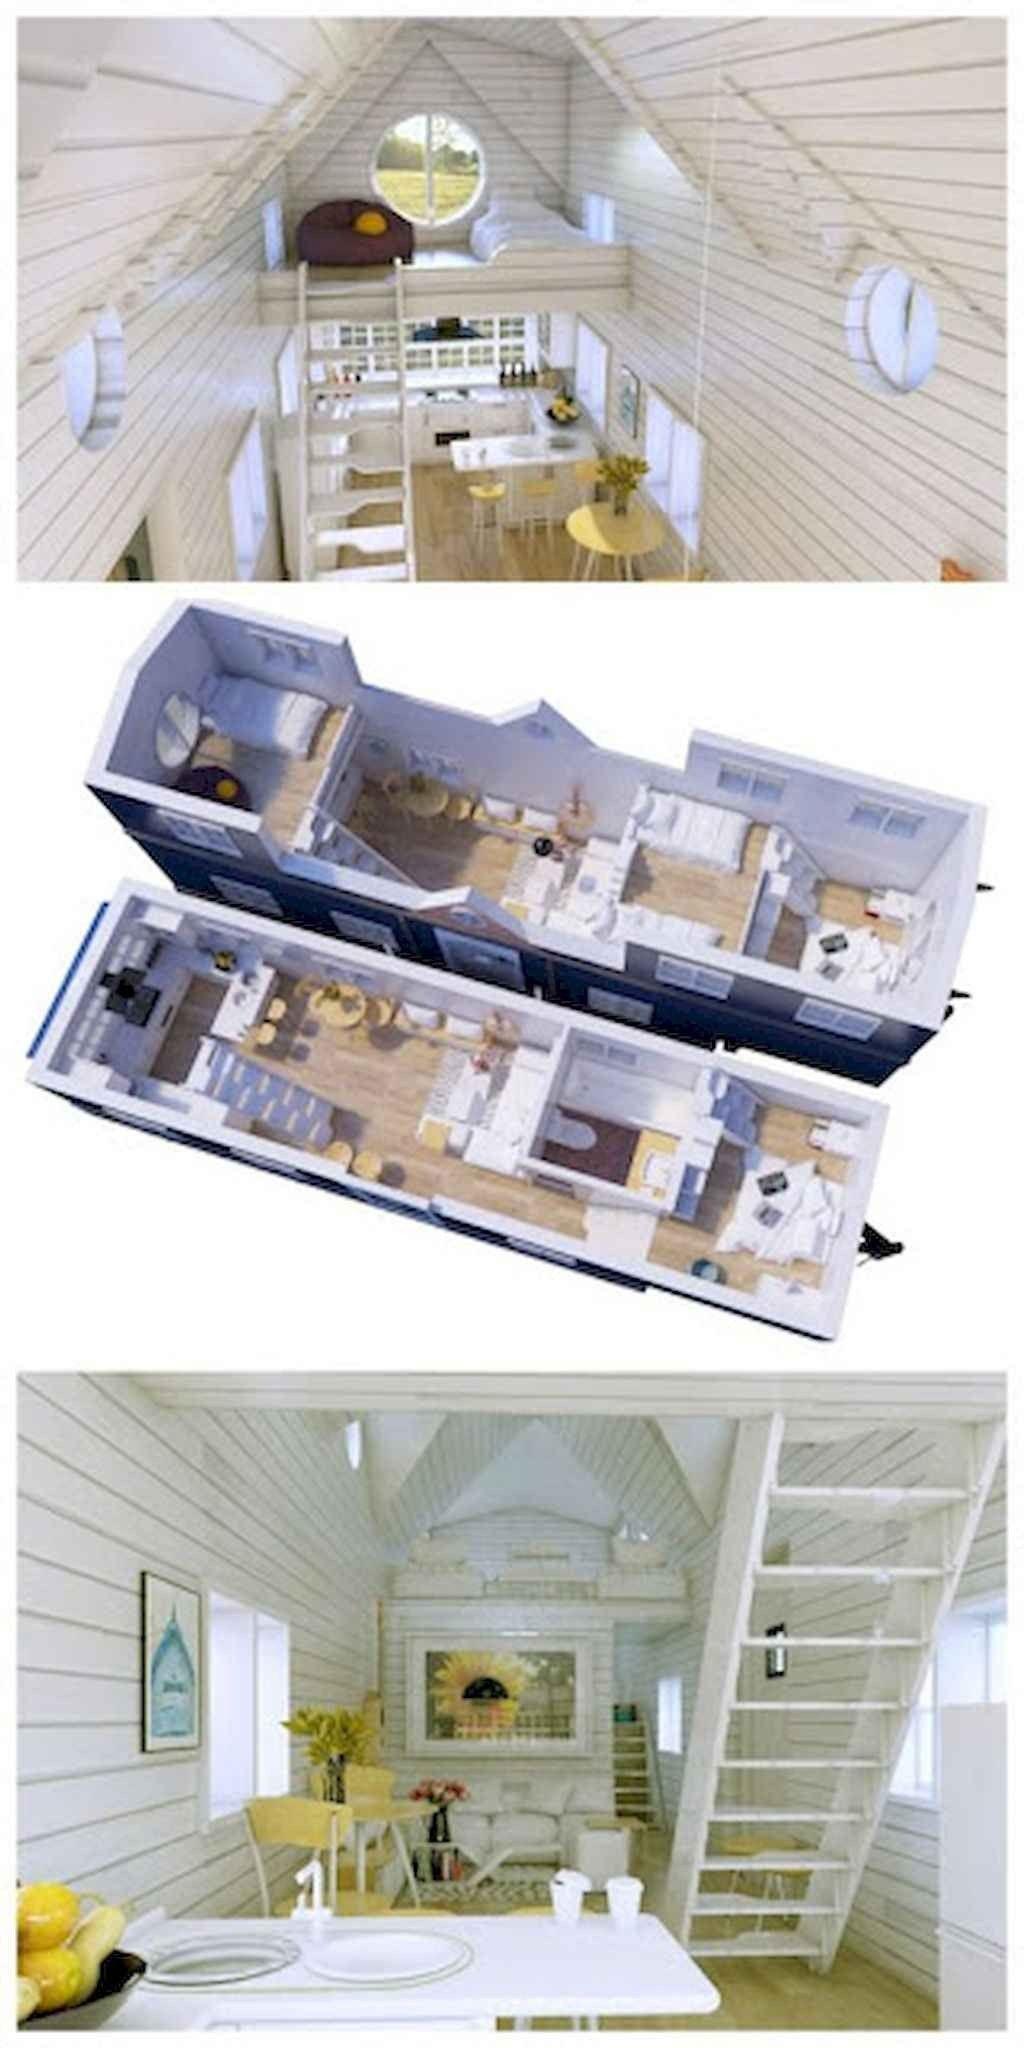 80 funny tiny house ideas organization tips home tiny house tiny house design tiny house. Black Bedroom Furniture Sets. Home Design Ideas